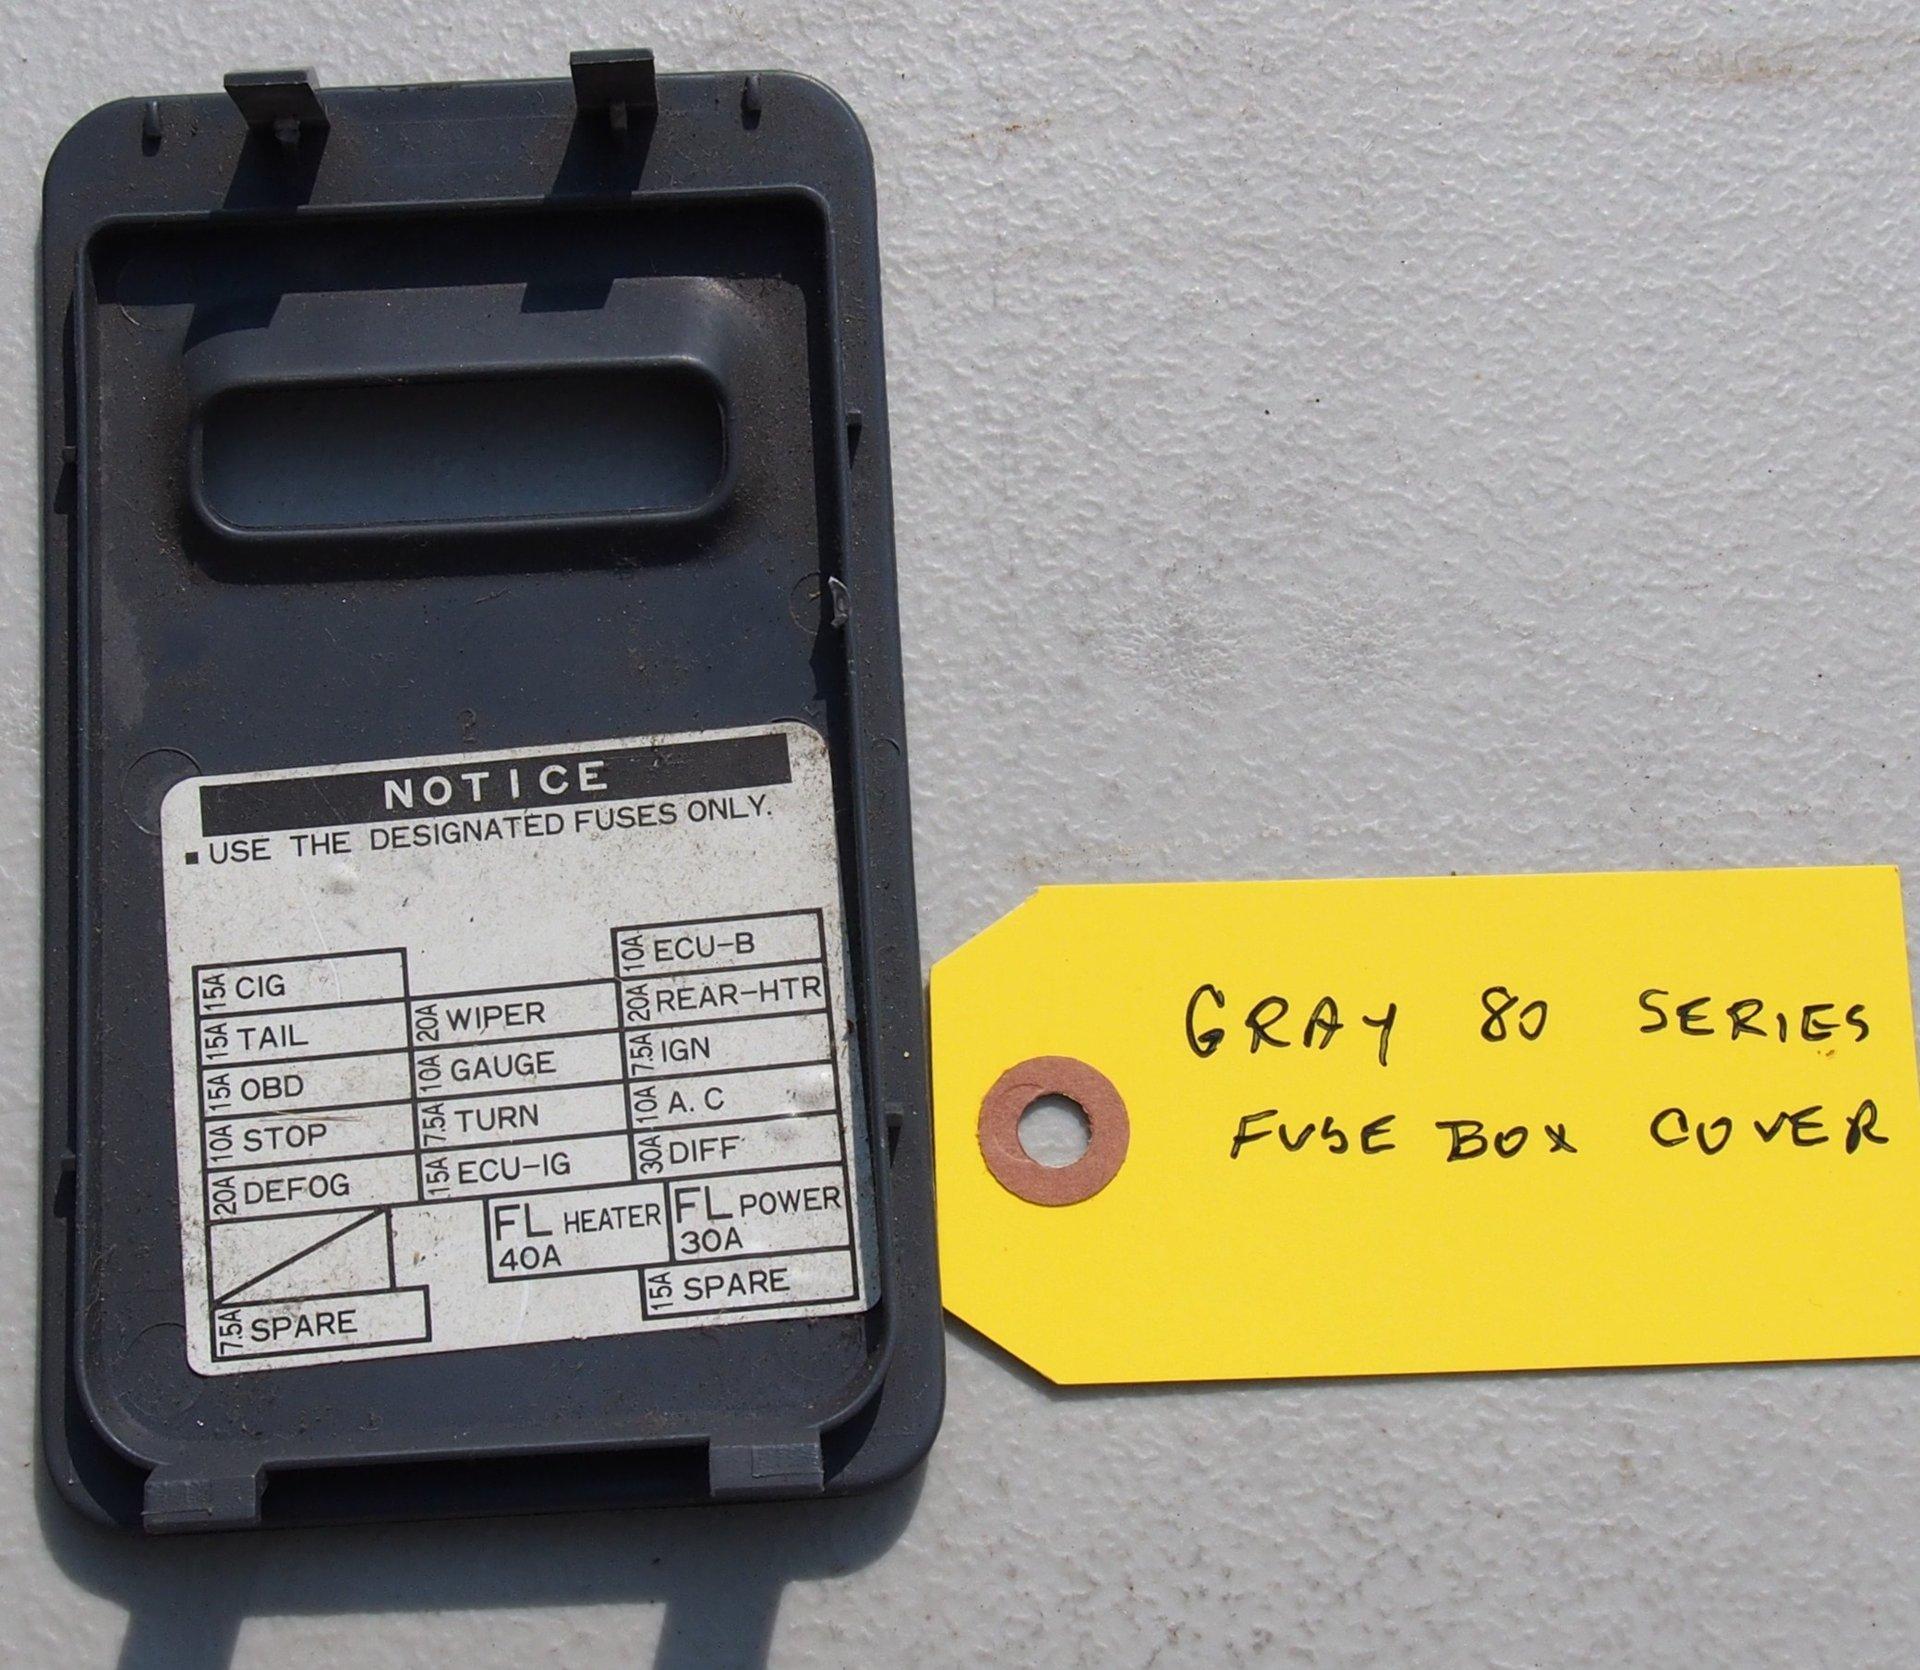 Gray 80 series fuse box cover.